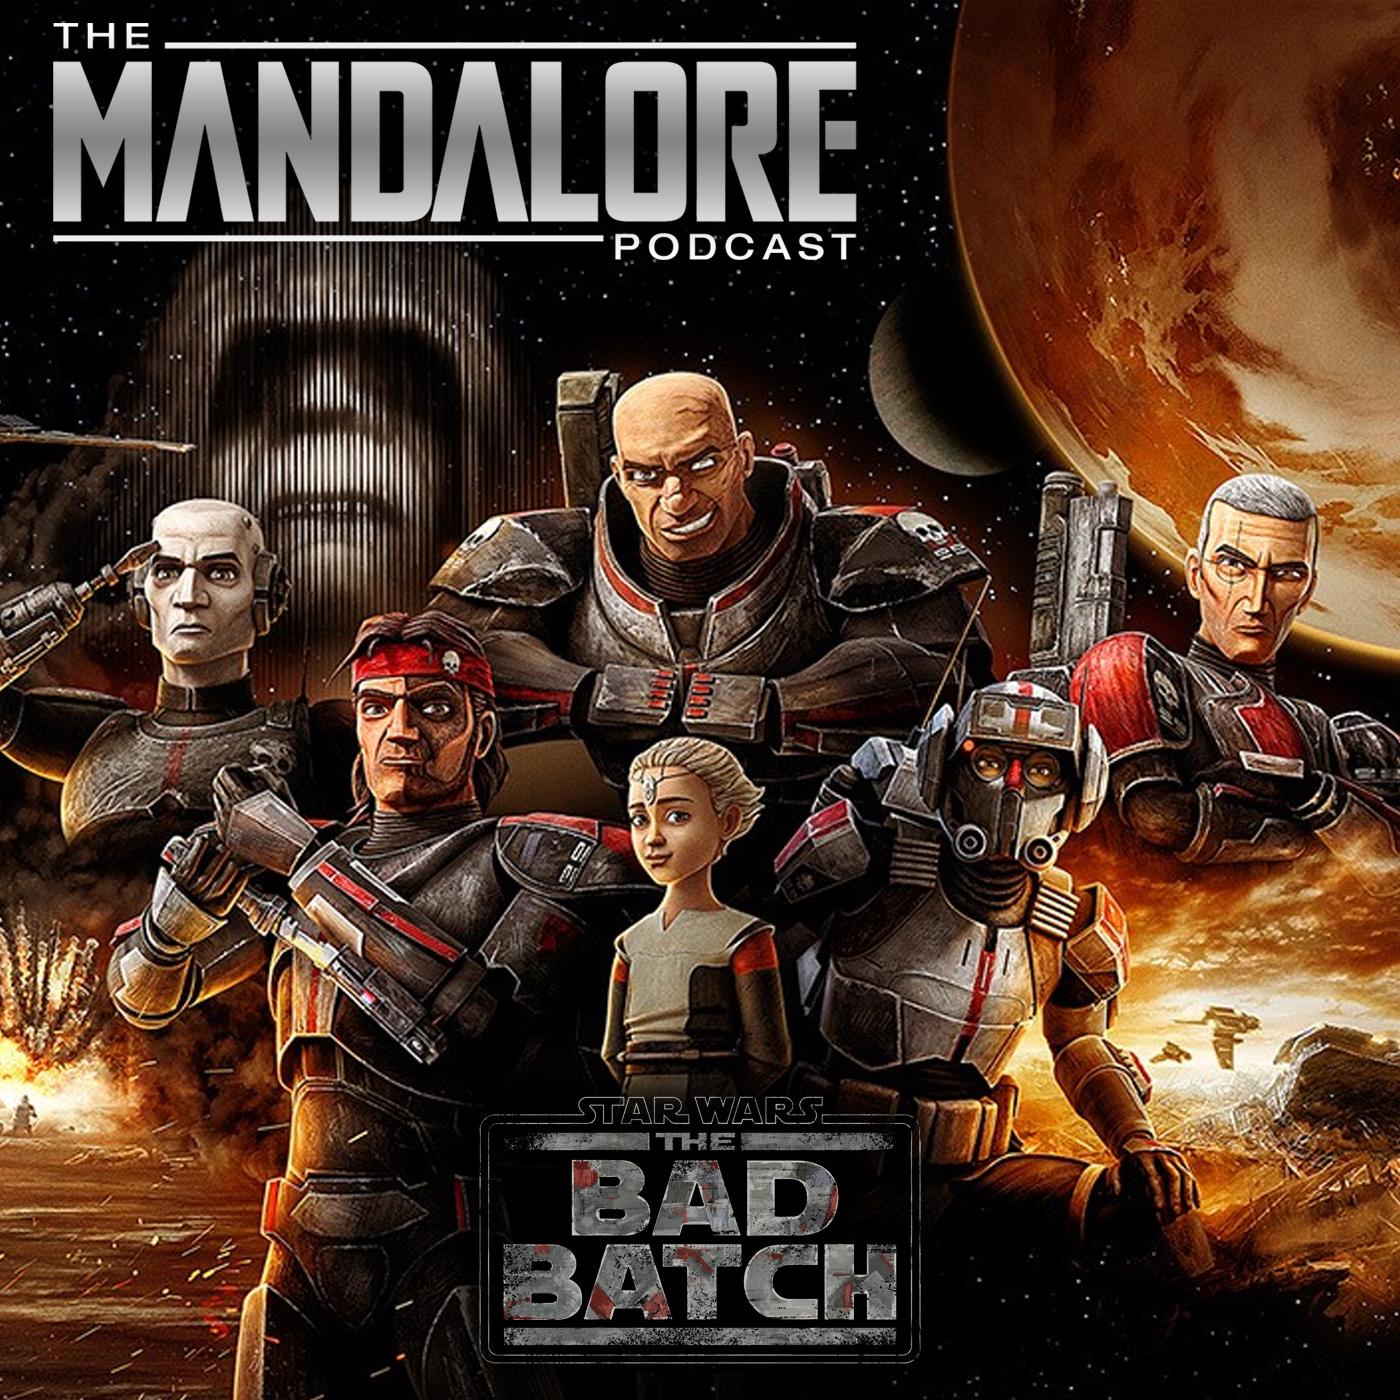 The Bad Batch - S1E8 - Reunion